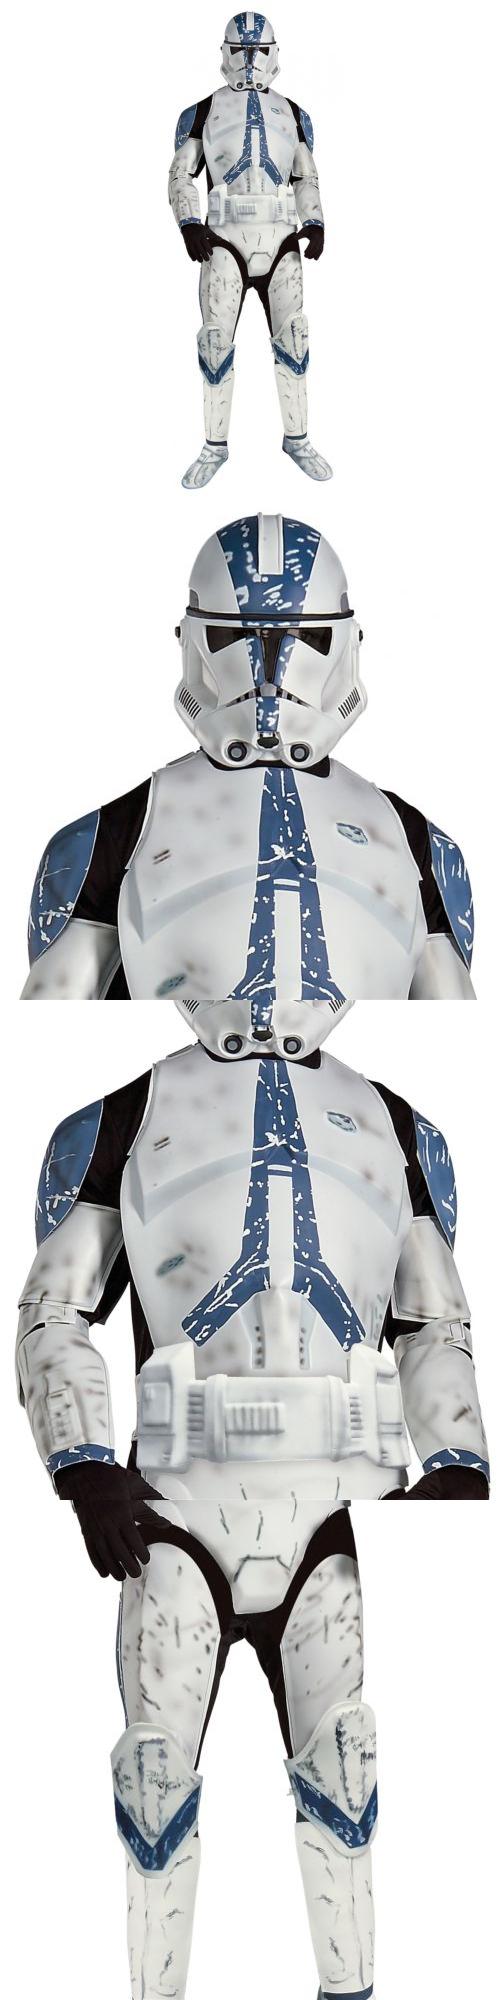 Men 52762 Deluxe Clone Trooper Star Wars Adult Men Imperial Stormtrooper Halloween Costume -u003e  sc 1 st  Pinterest & Men 52762: Deluxe Clone Trooper Star Wars Adult Men Imperial ...